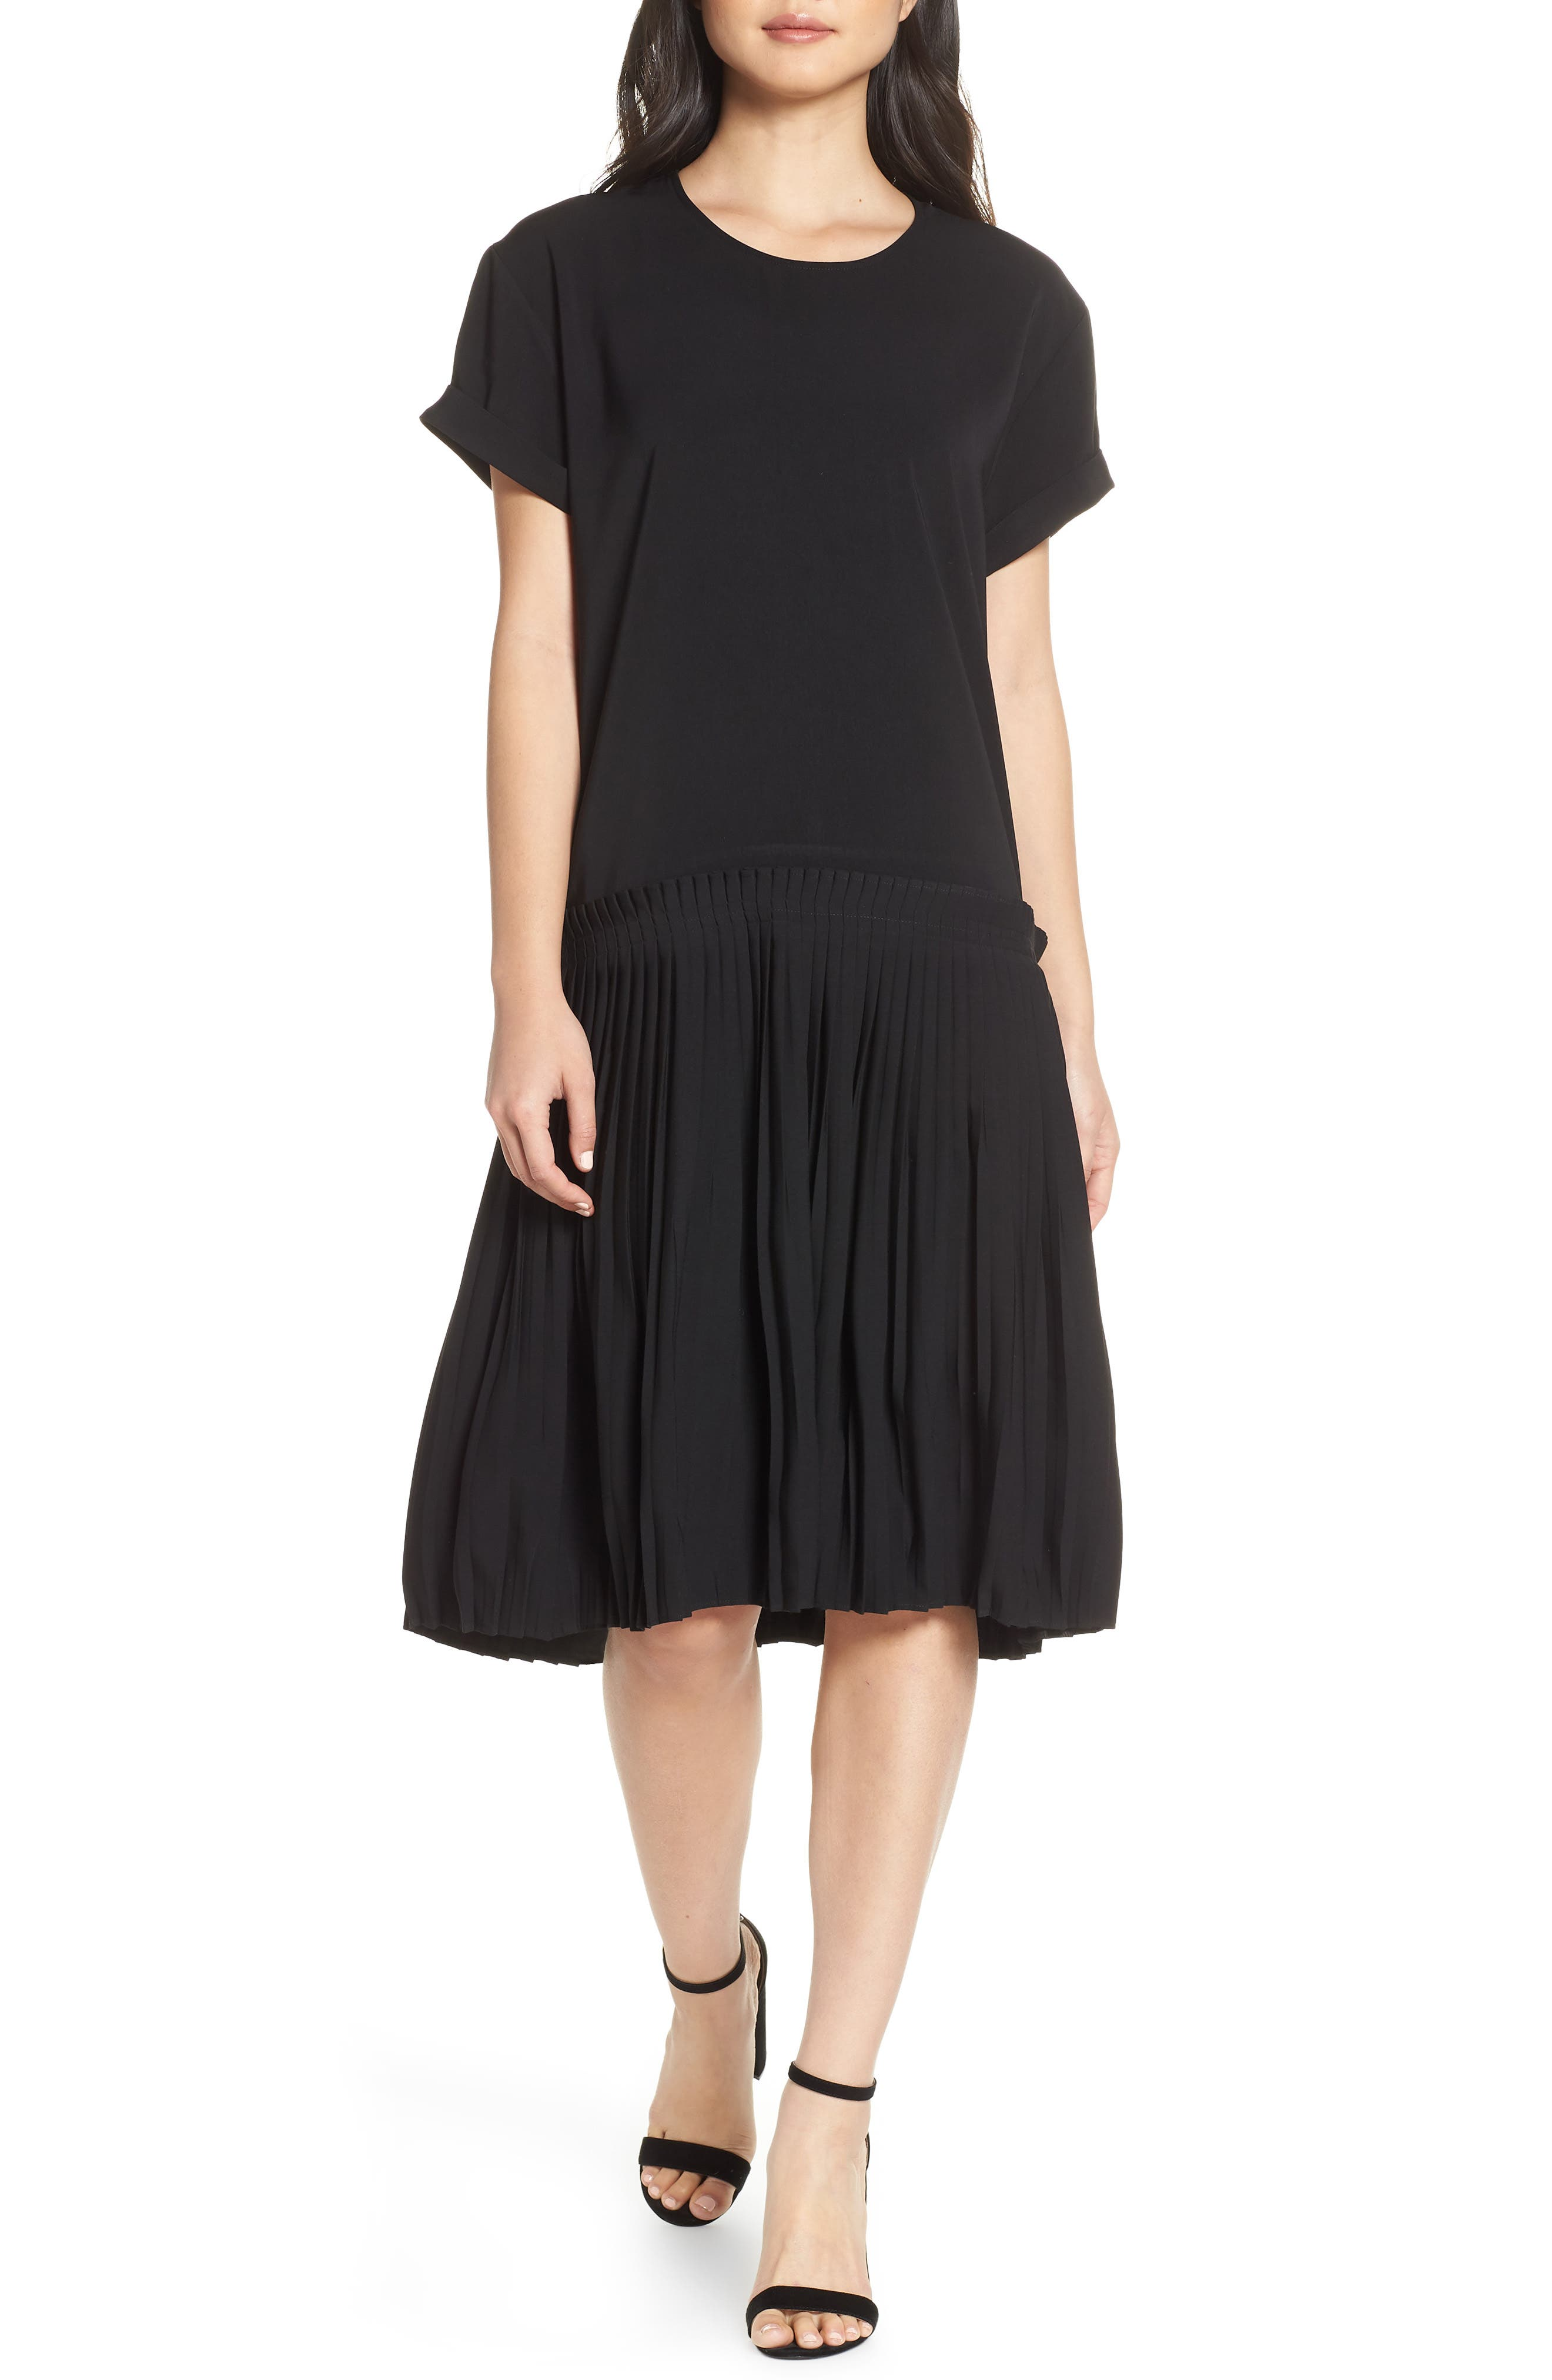 c4468271dd Caara Crystal Pleated Drop Waist Shift Dress